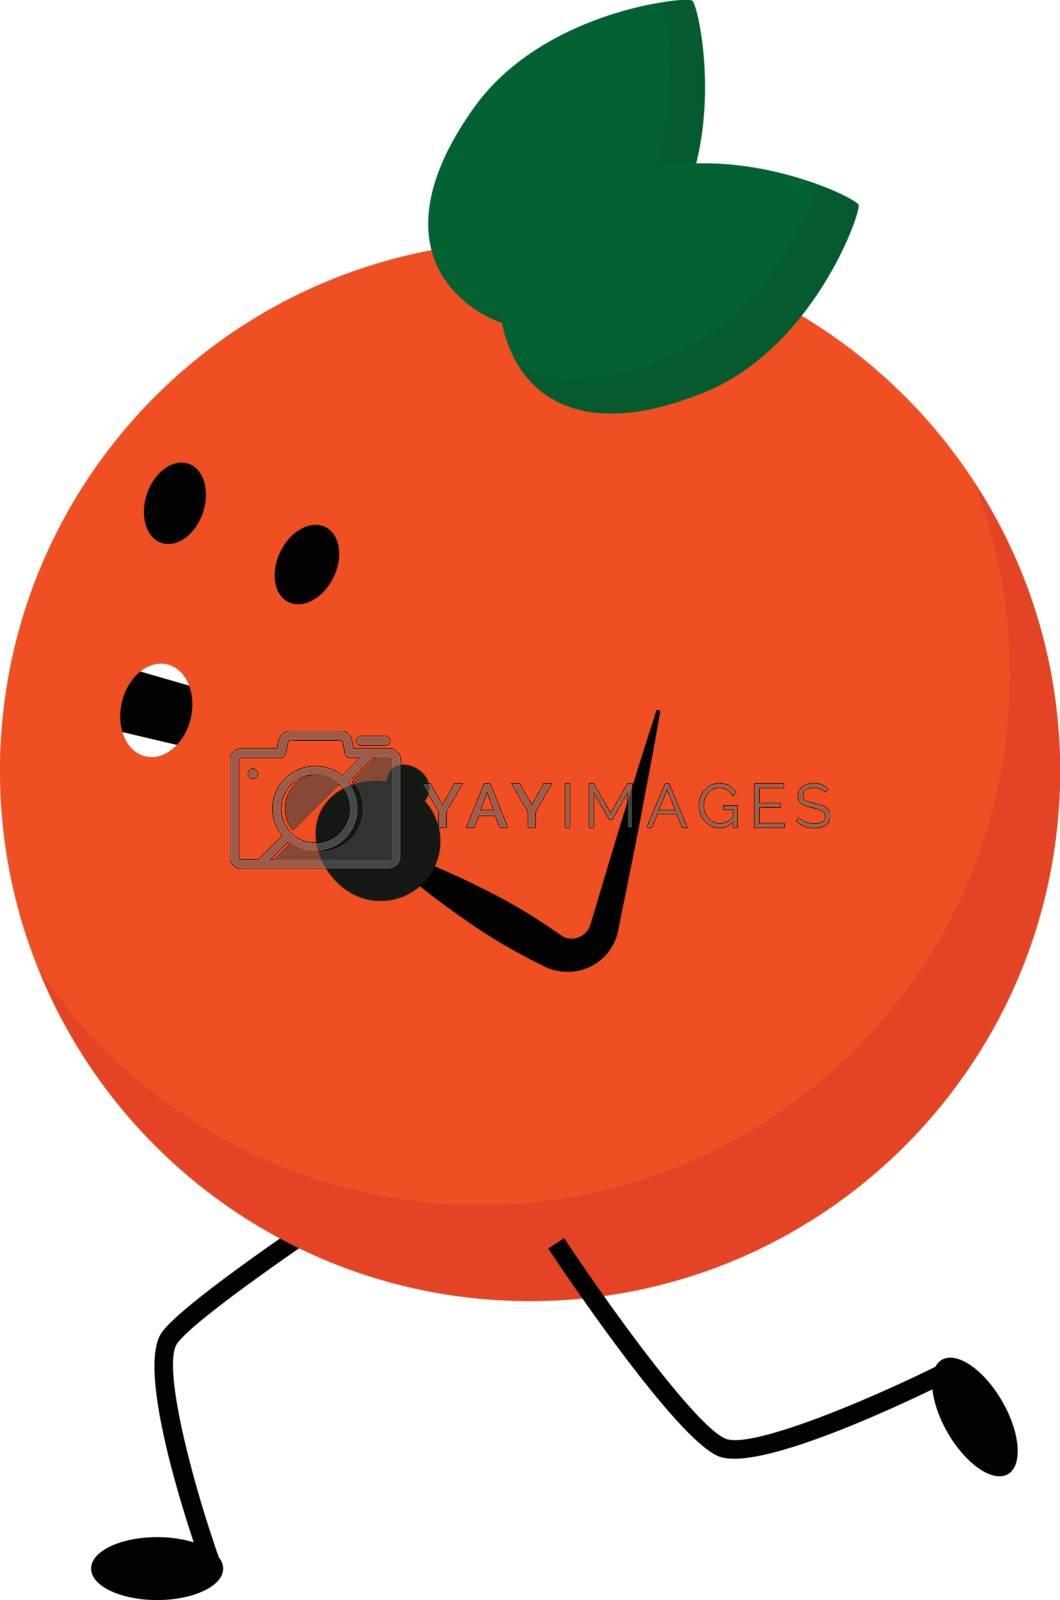 Royalty free image of Emoji of a running orange fruit vector or color illustration by Morphart